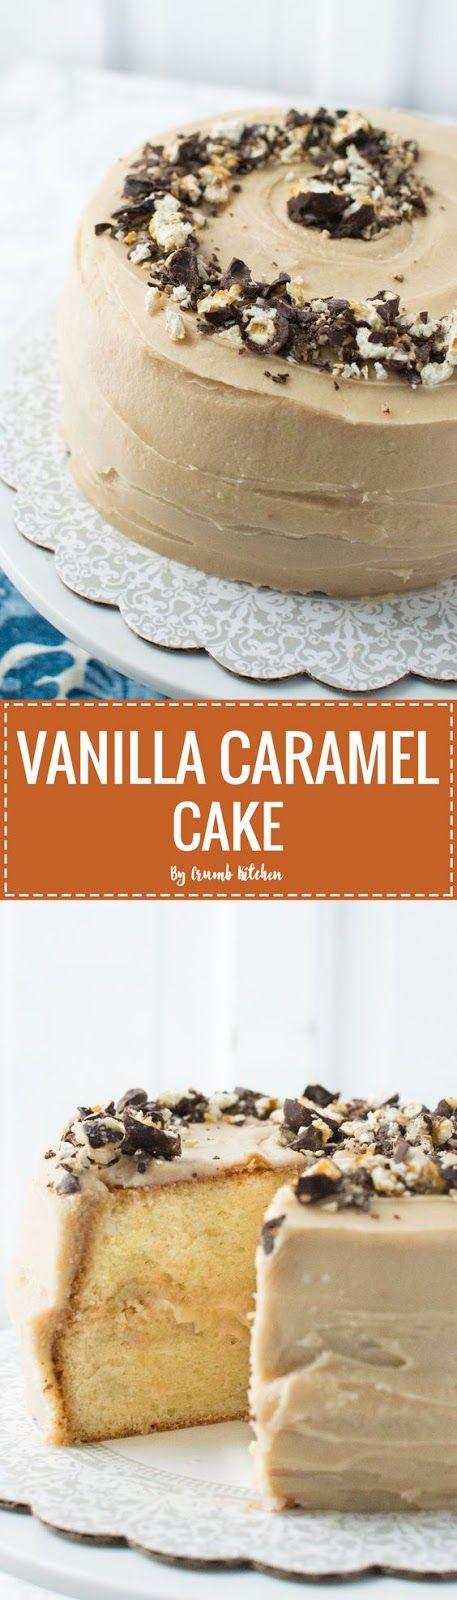 VANILLA CARAMEL CAKE | Food And Cake Recipes